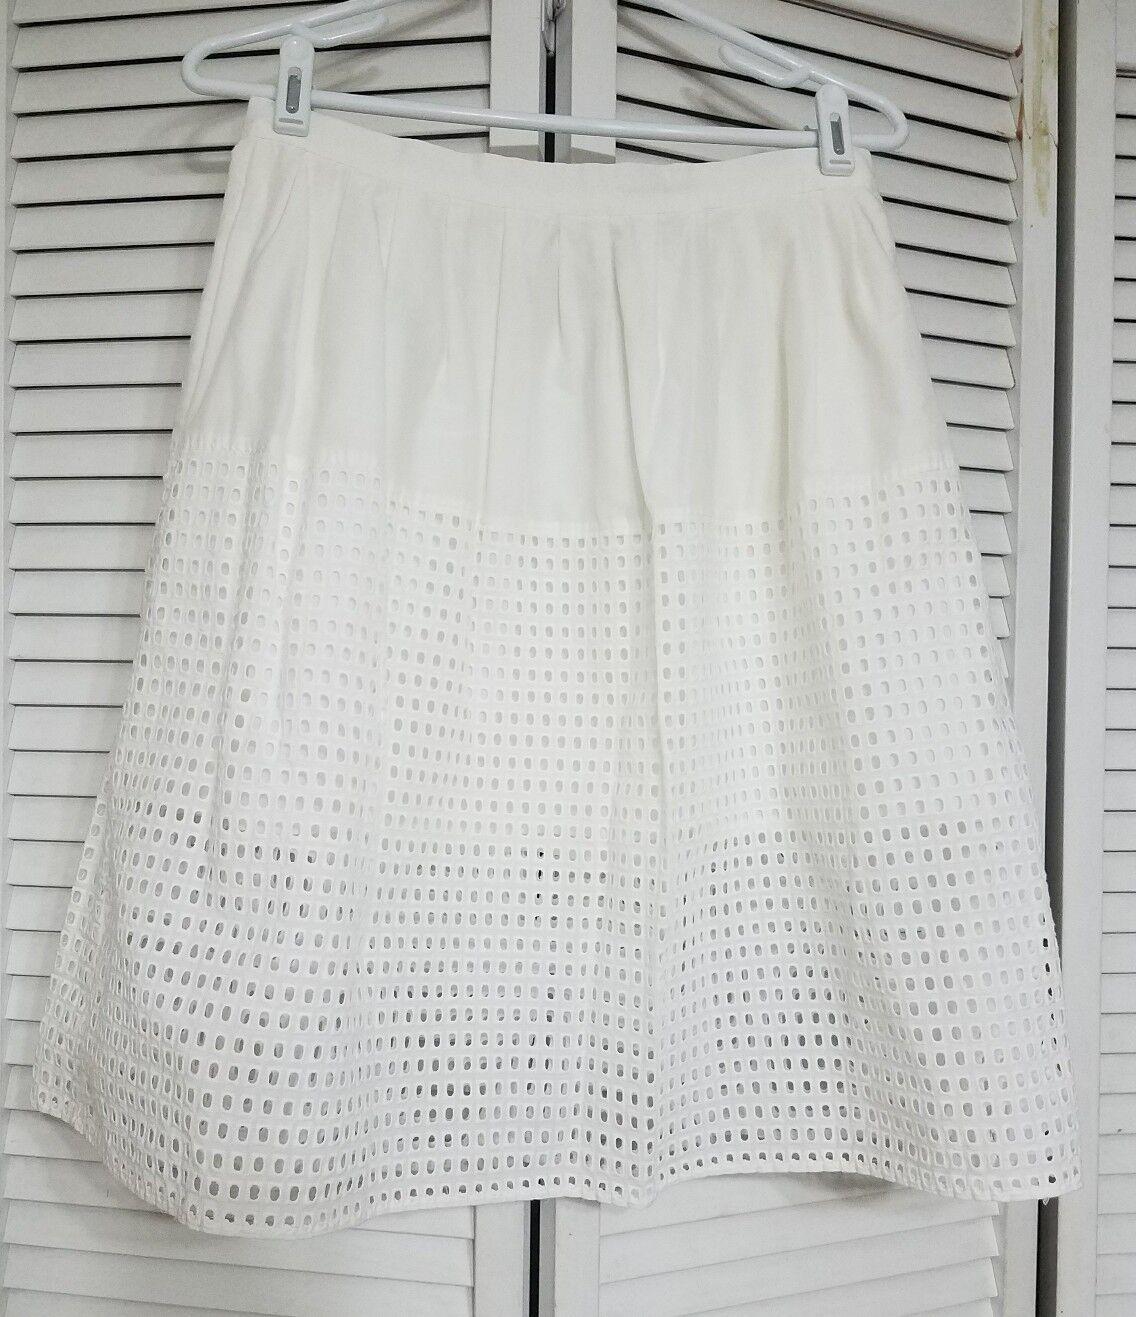 Chelsea 28 Ivory Eyelet Skirt, Size Small